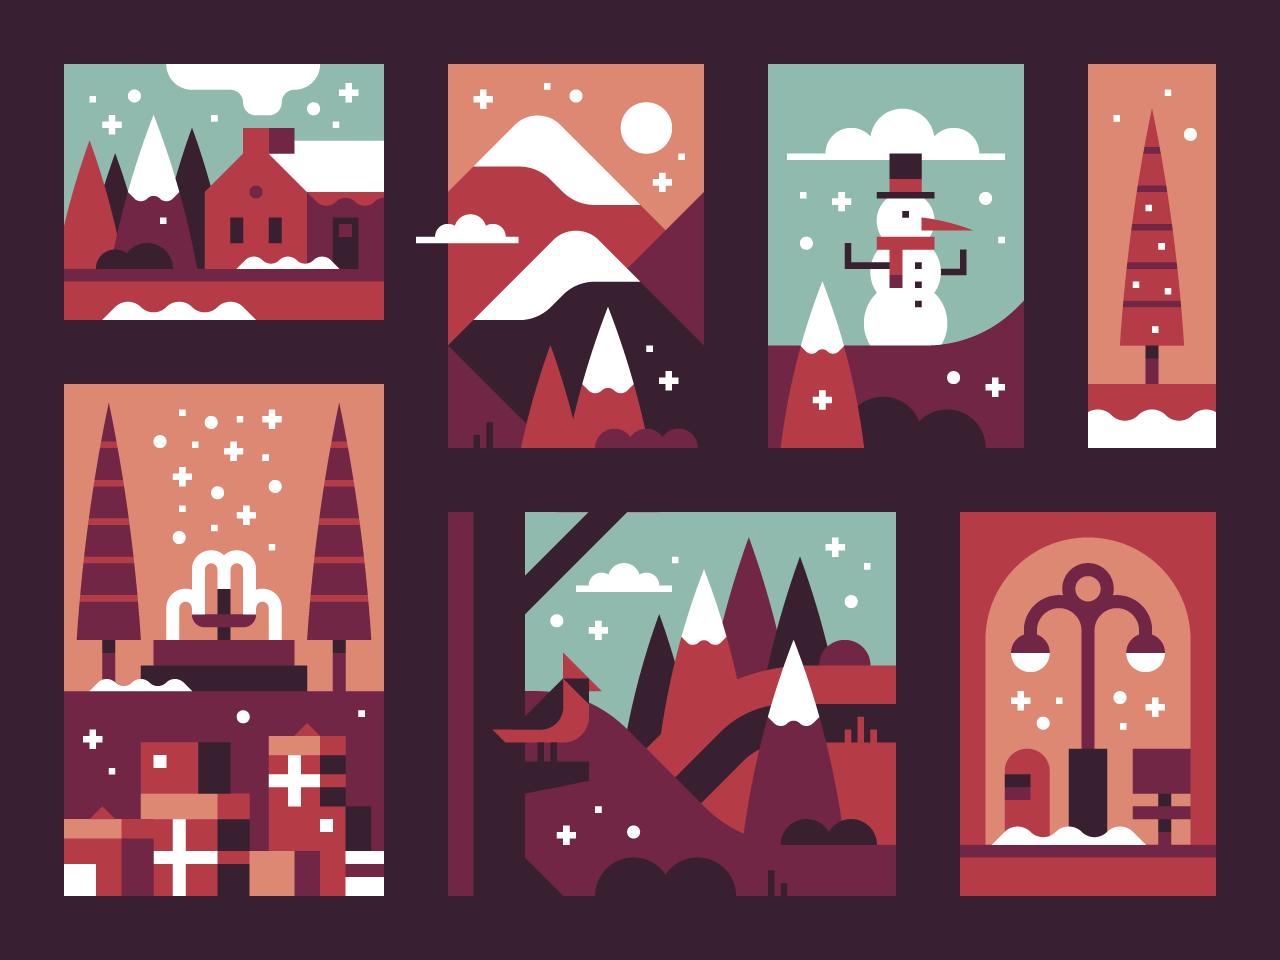 2017 holiday card by Alex Pasquarella